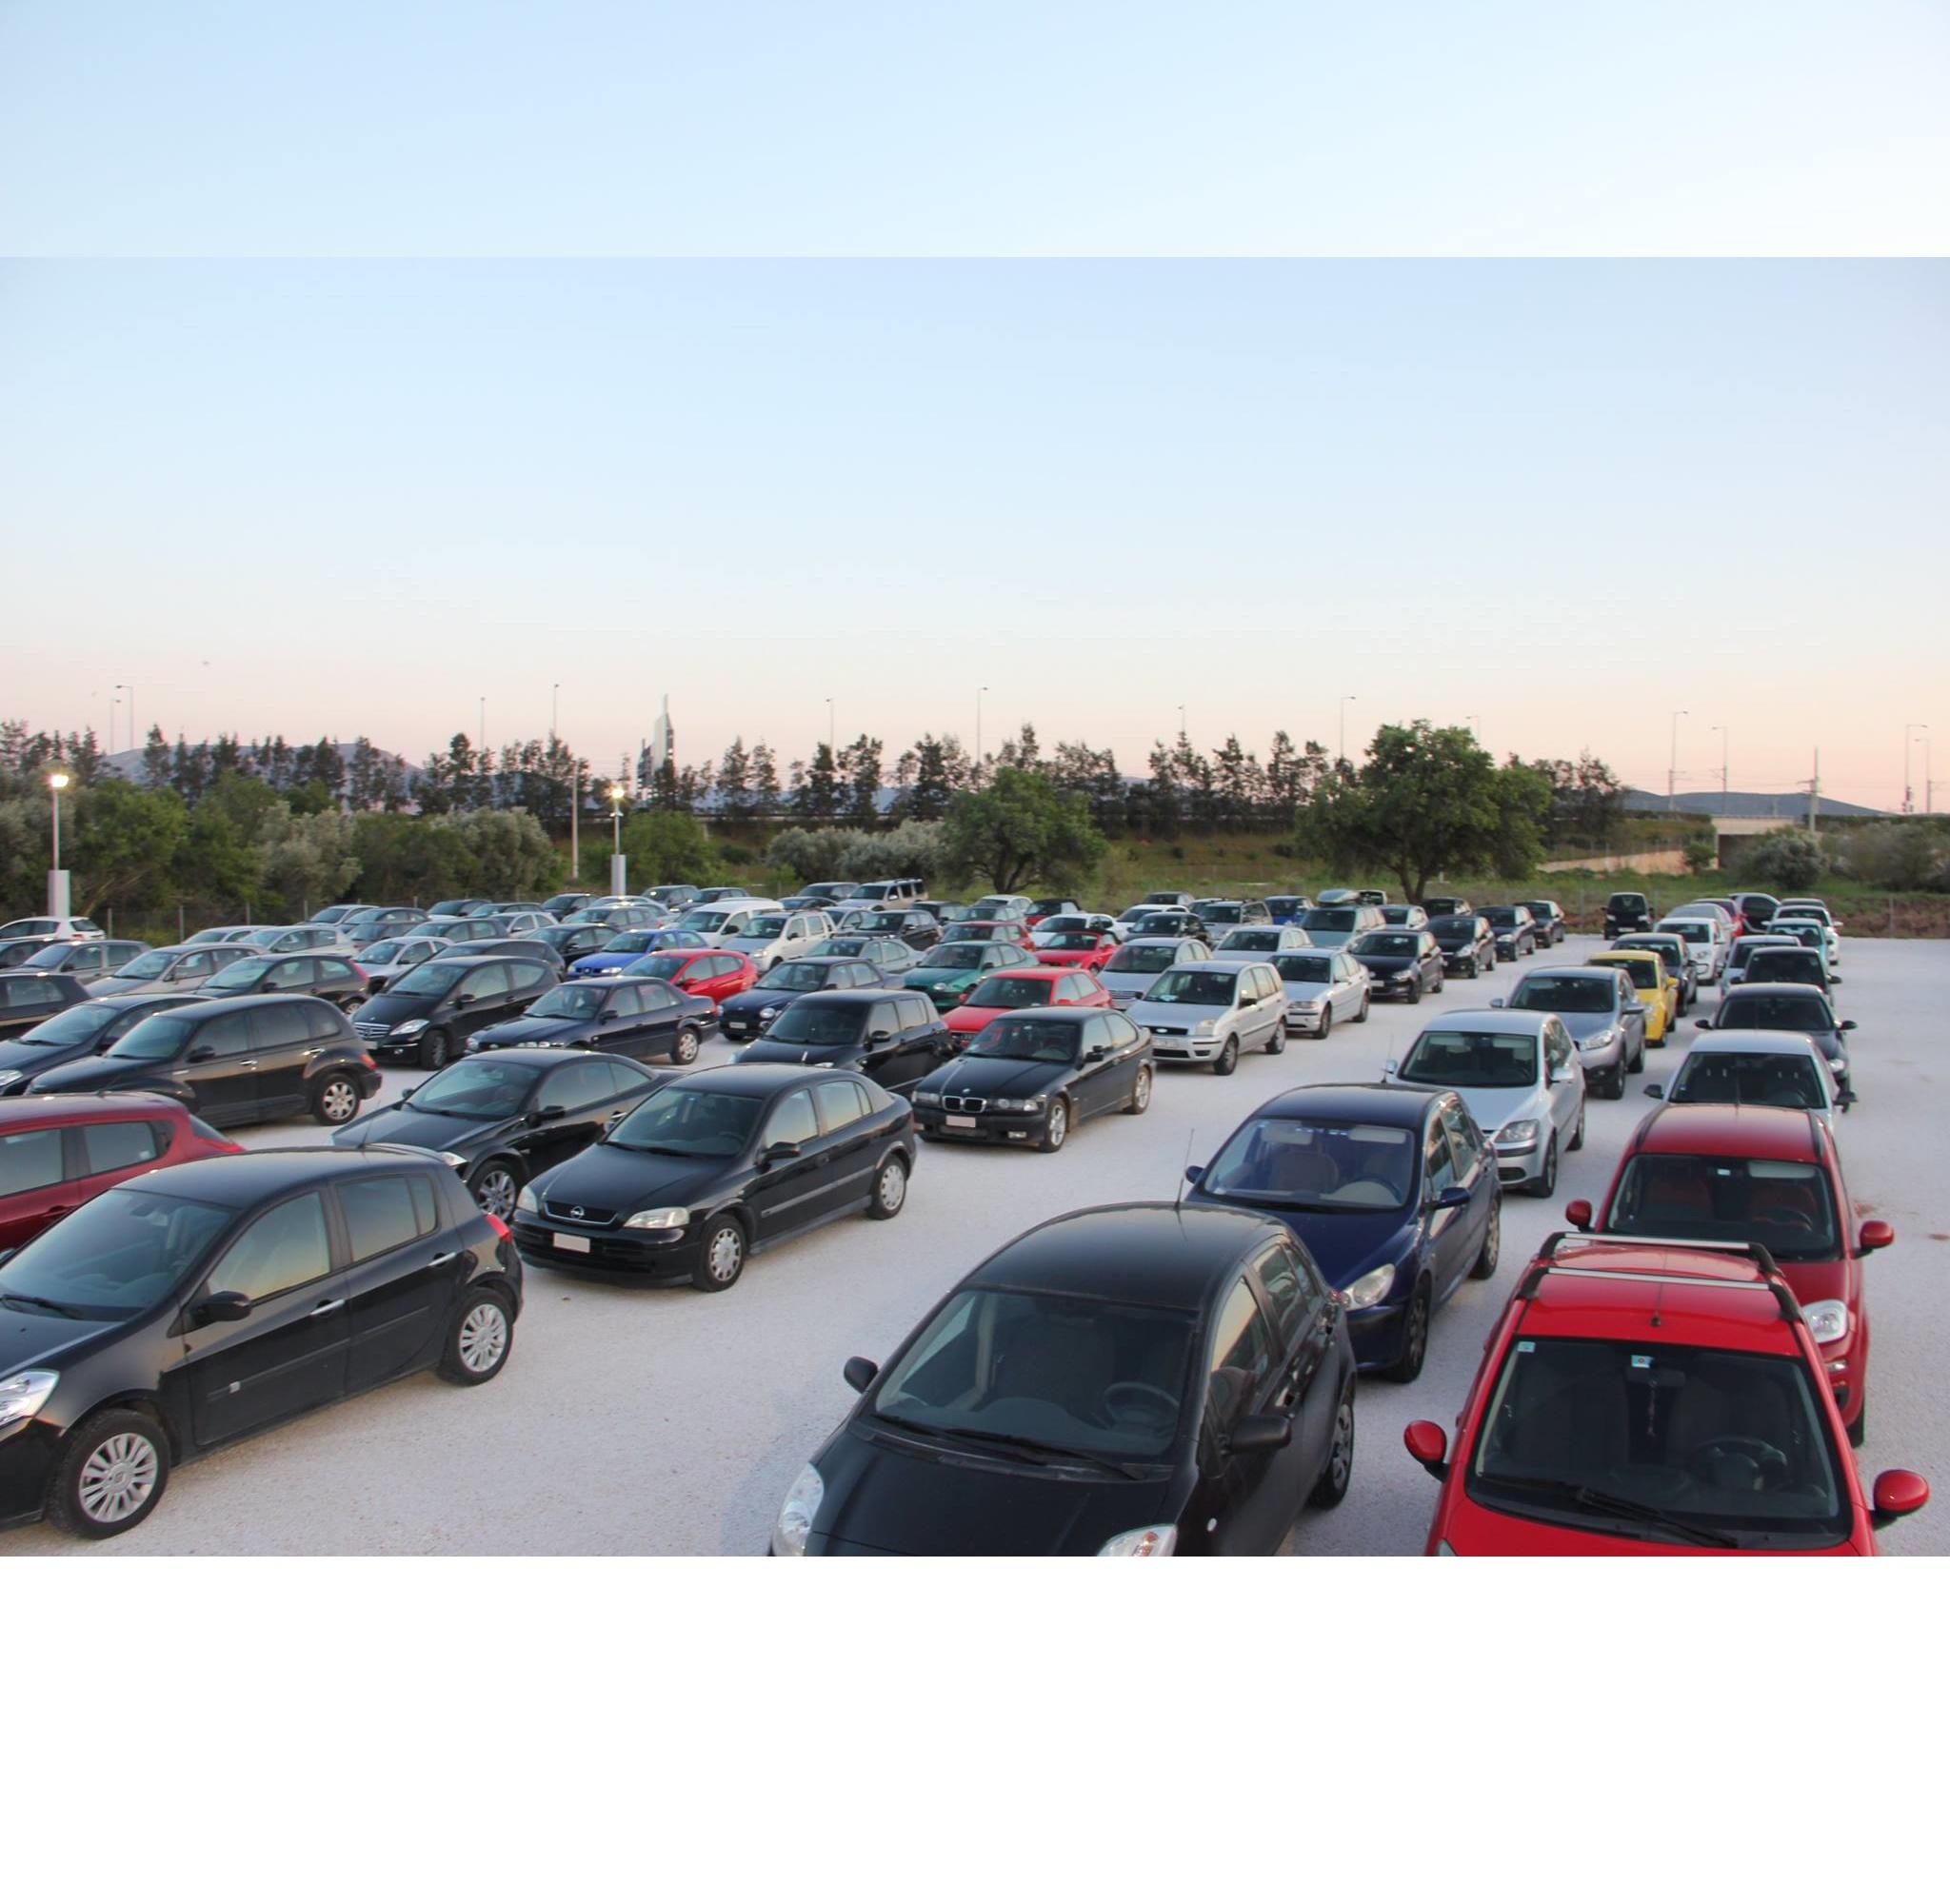 https://direct.parkcloud.com/images/operator/00000000-0000-0000-0000-000000000000/17148